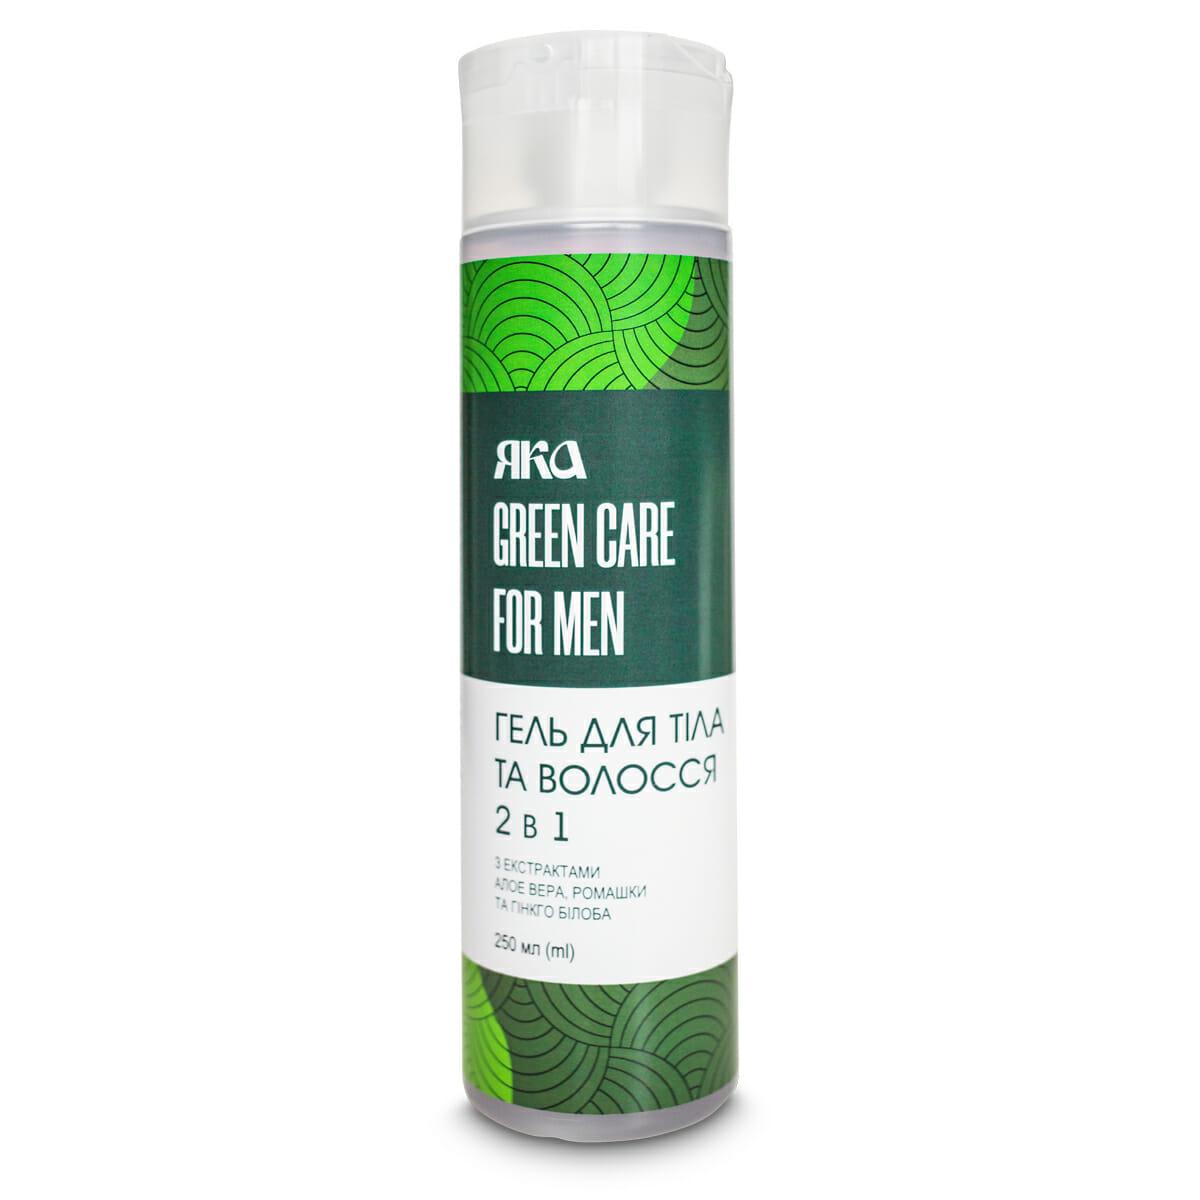 Гель для тіла та шампунь для волосся